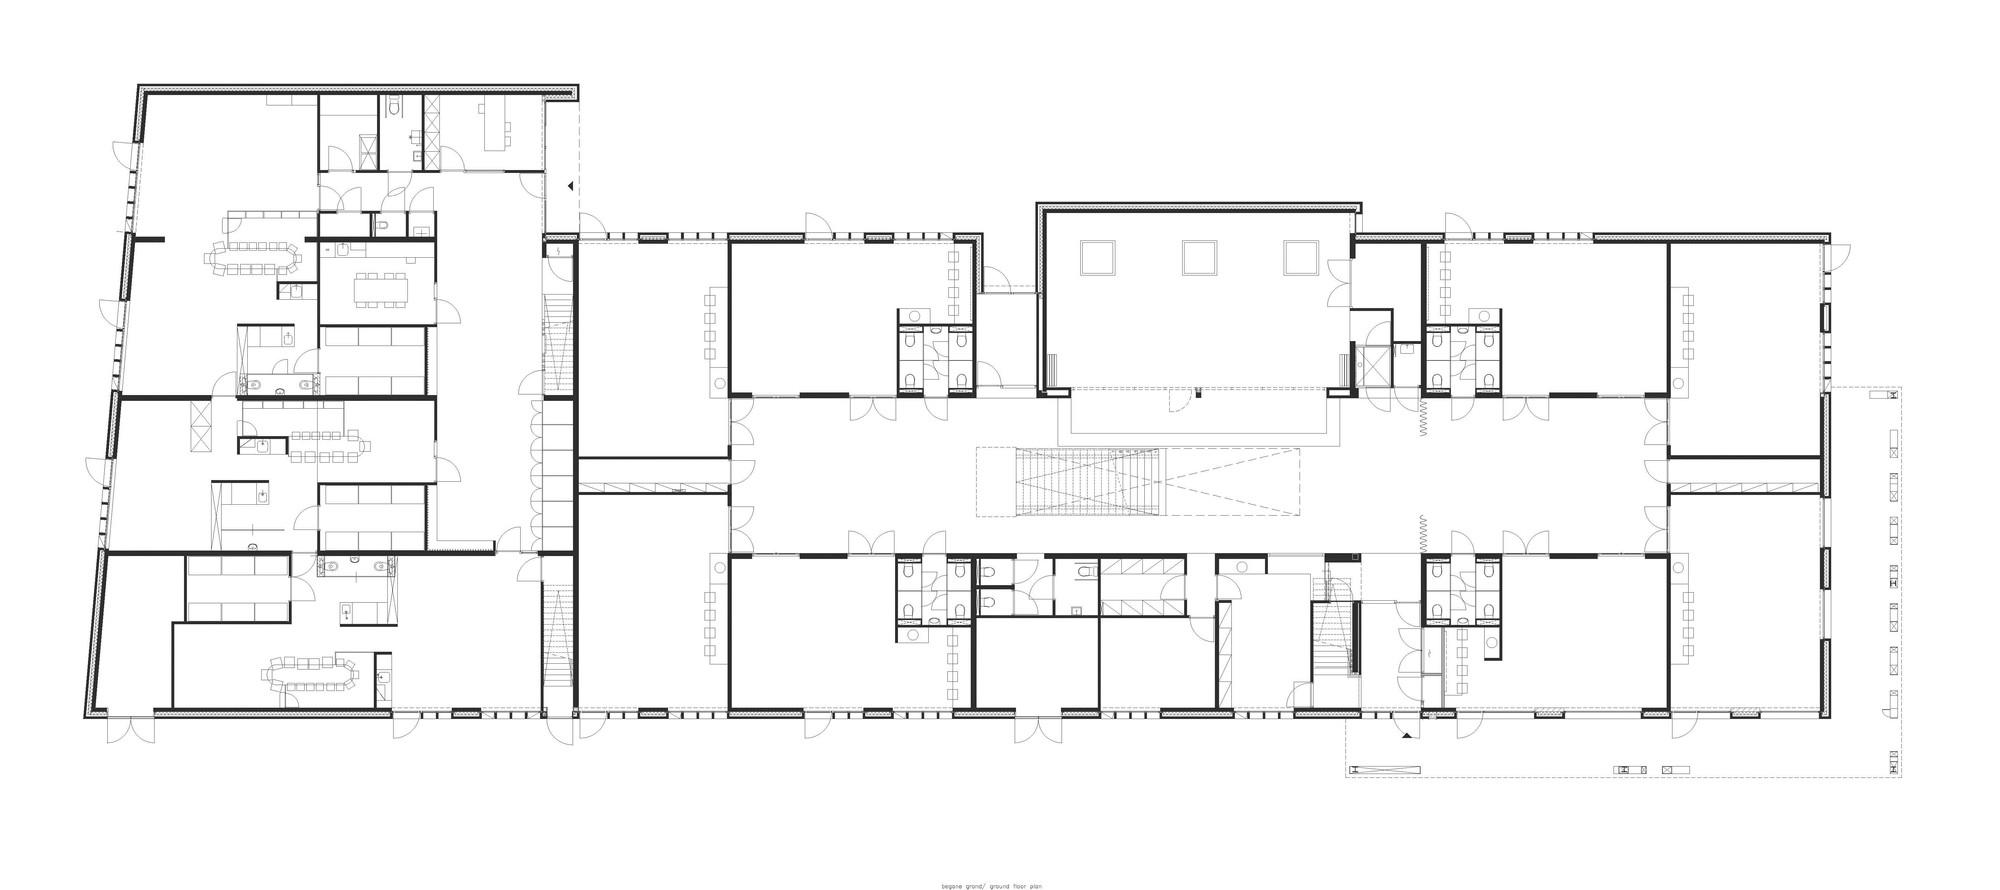 Floor Plan Classroom Galer 237 A De Escuela Primaria De Vuurvogel Grosfeld Van